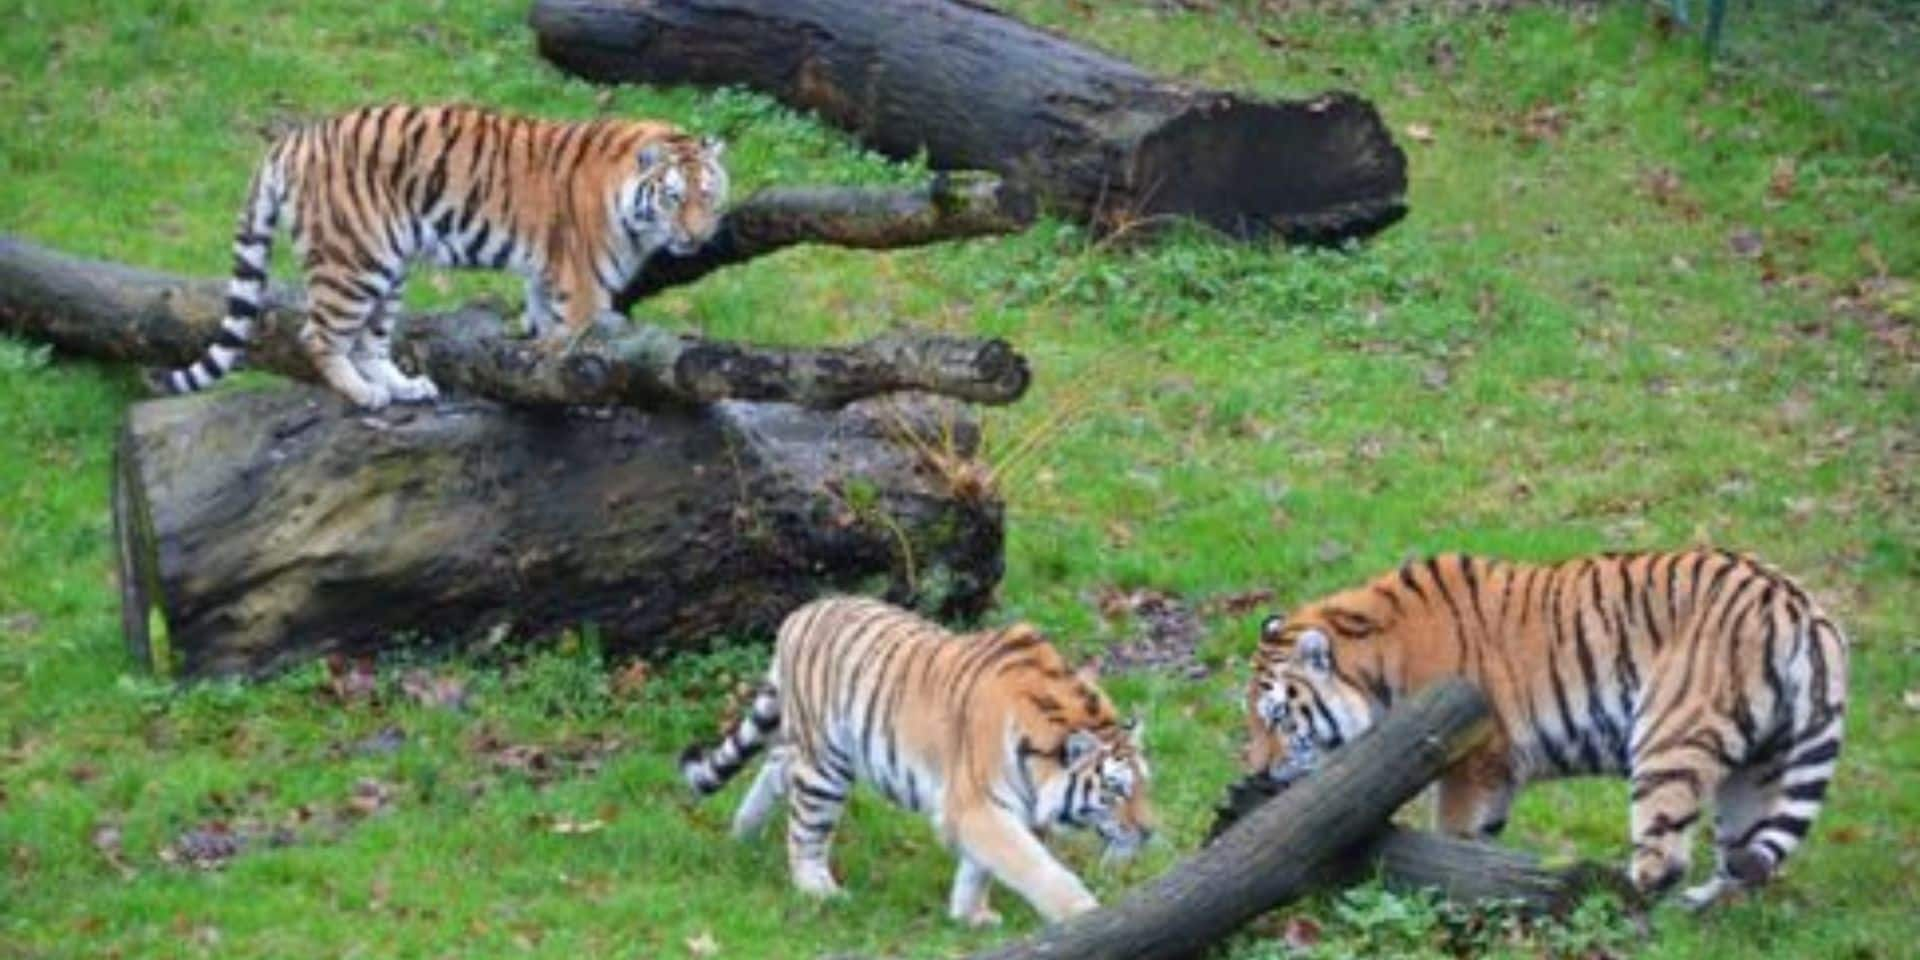 Bellewaerde accueillera quatre tigres de l'Amour, félins menacés d'extinction